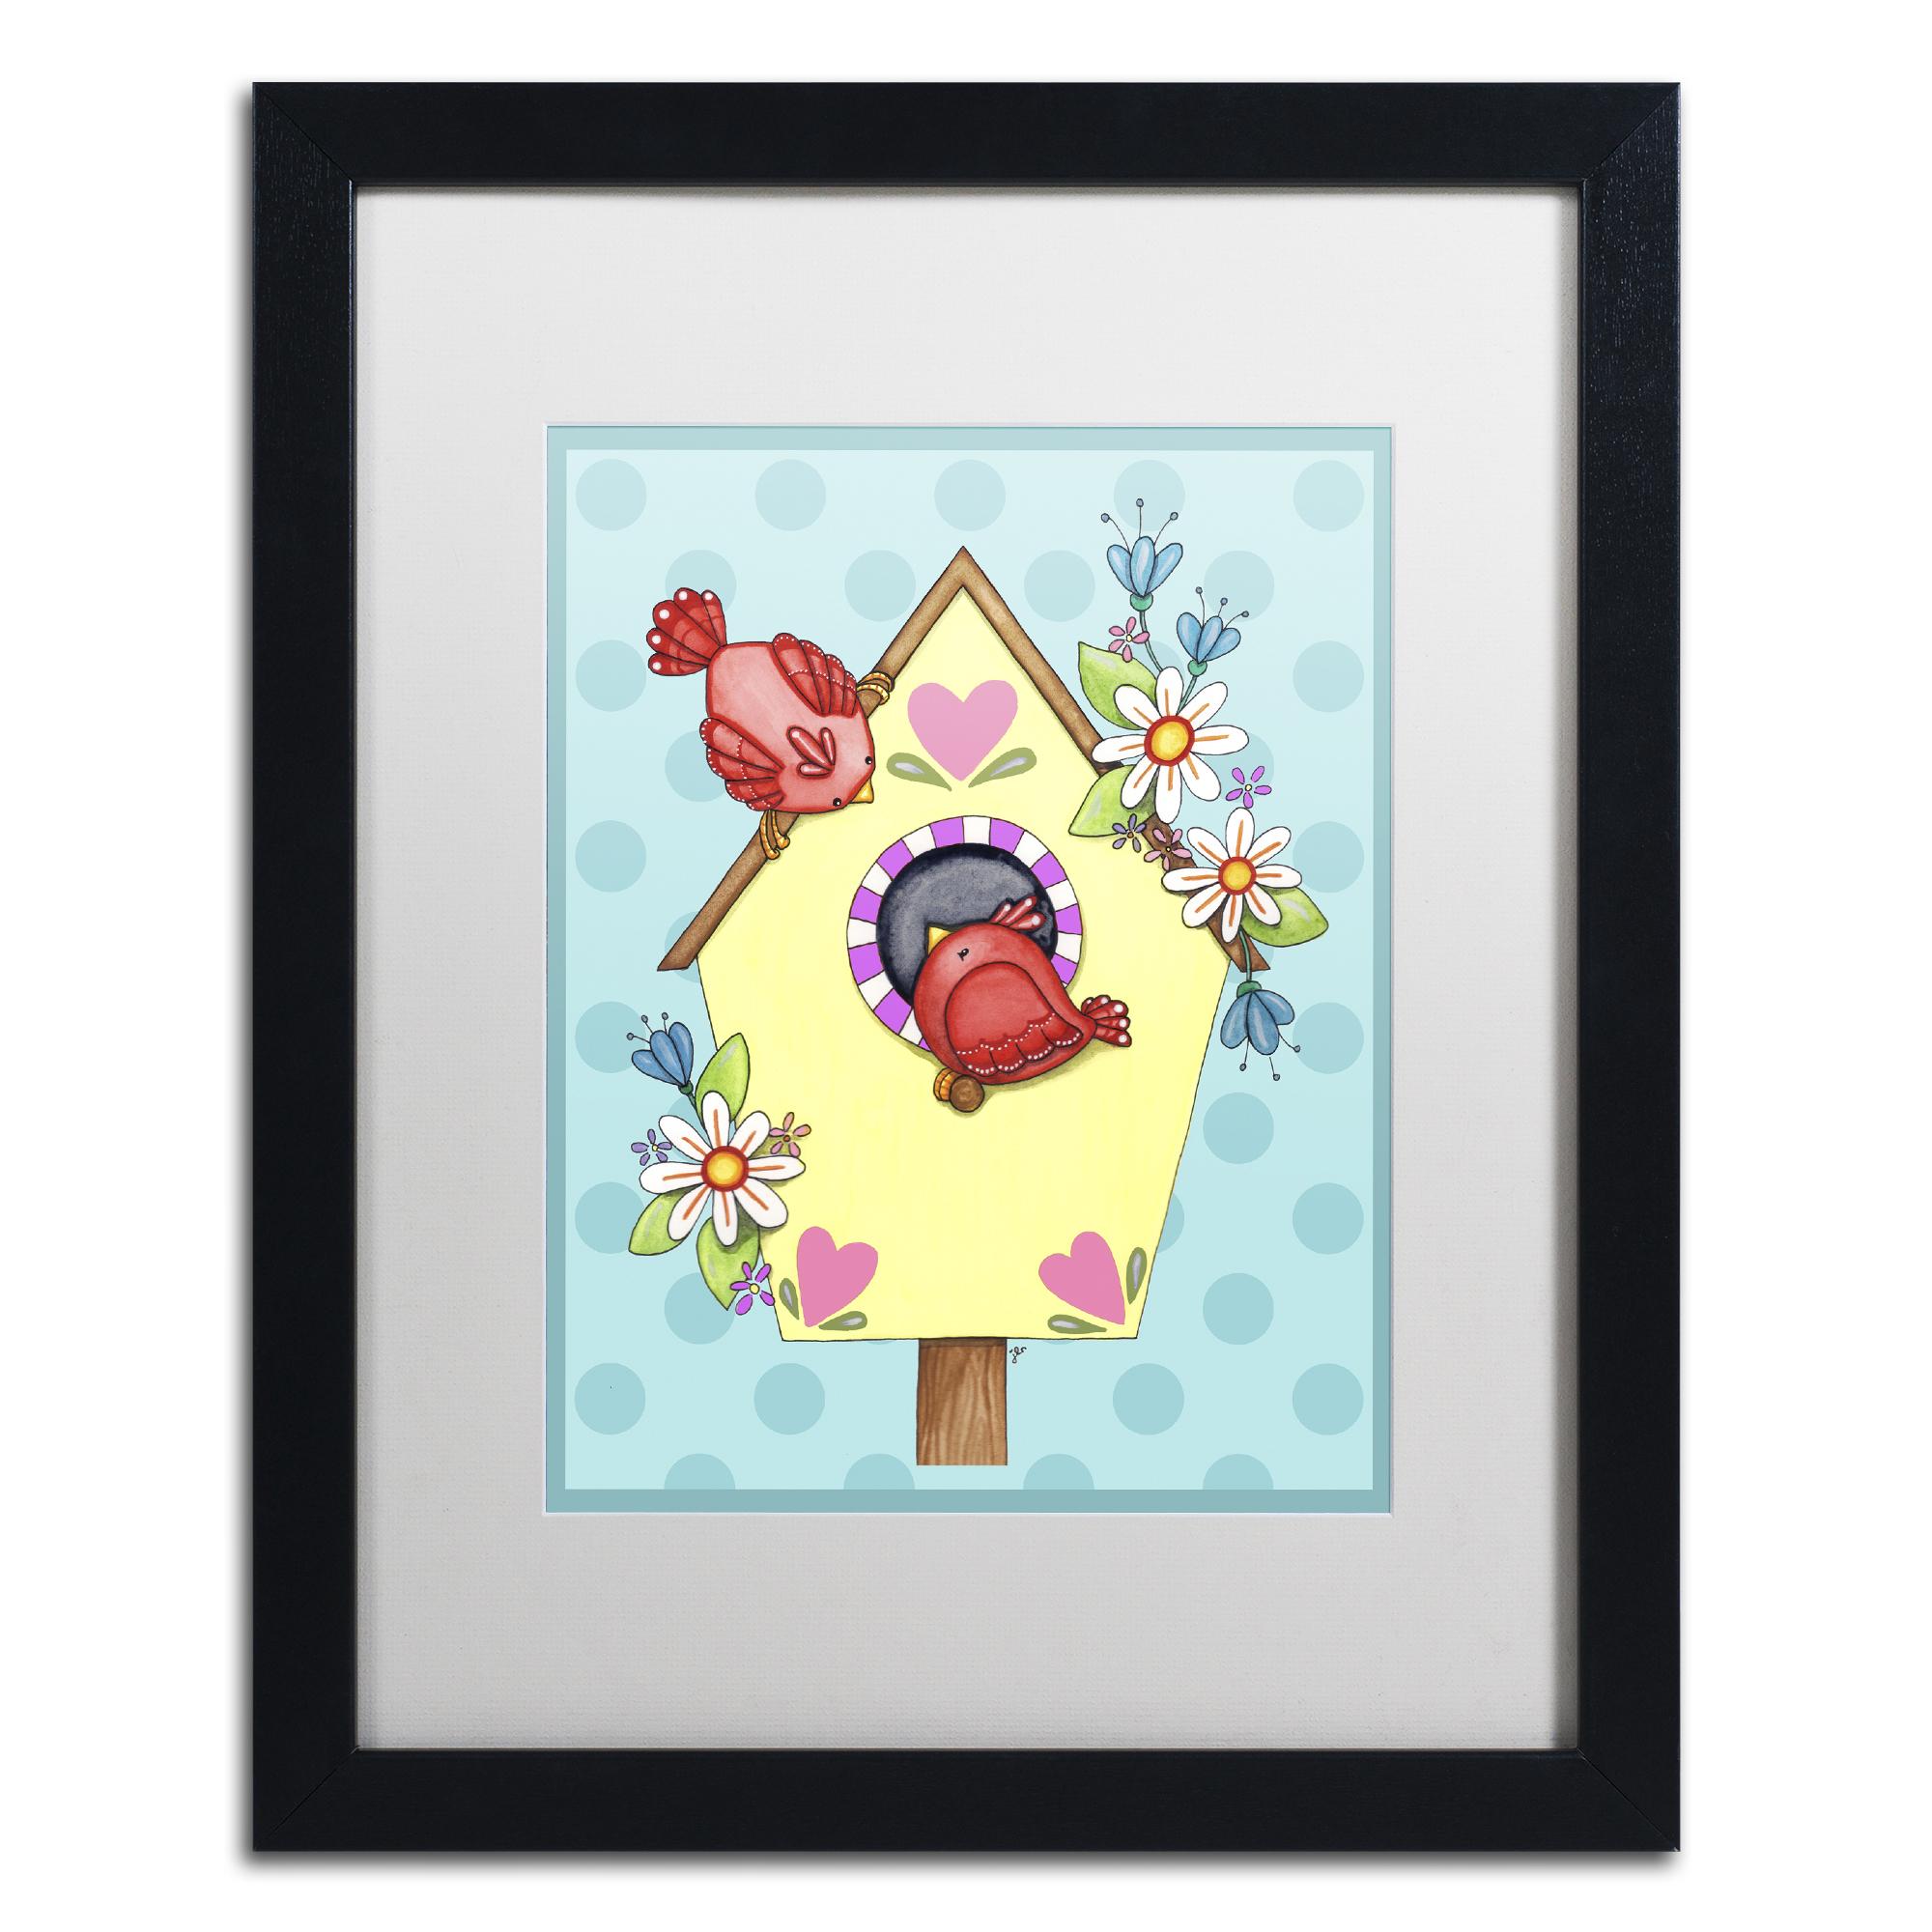 Jennifer Nilsson 'Home Tweet Home' Black Wooden Framed Art 18 x 22 Inches